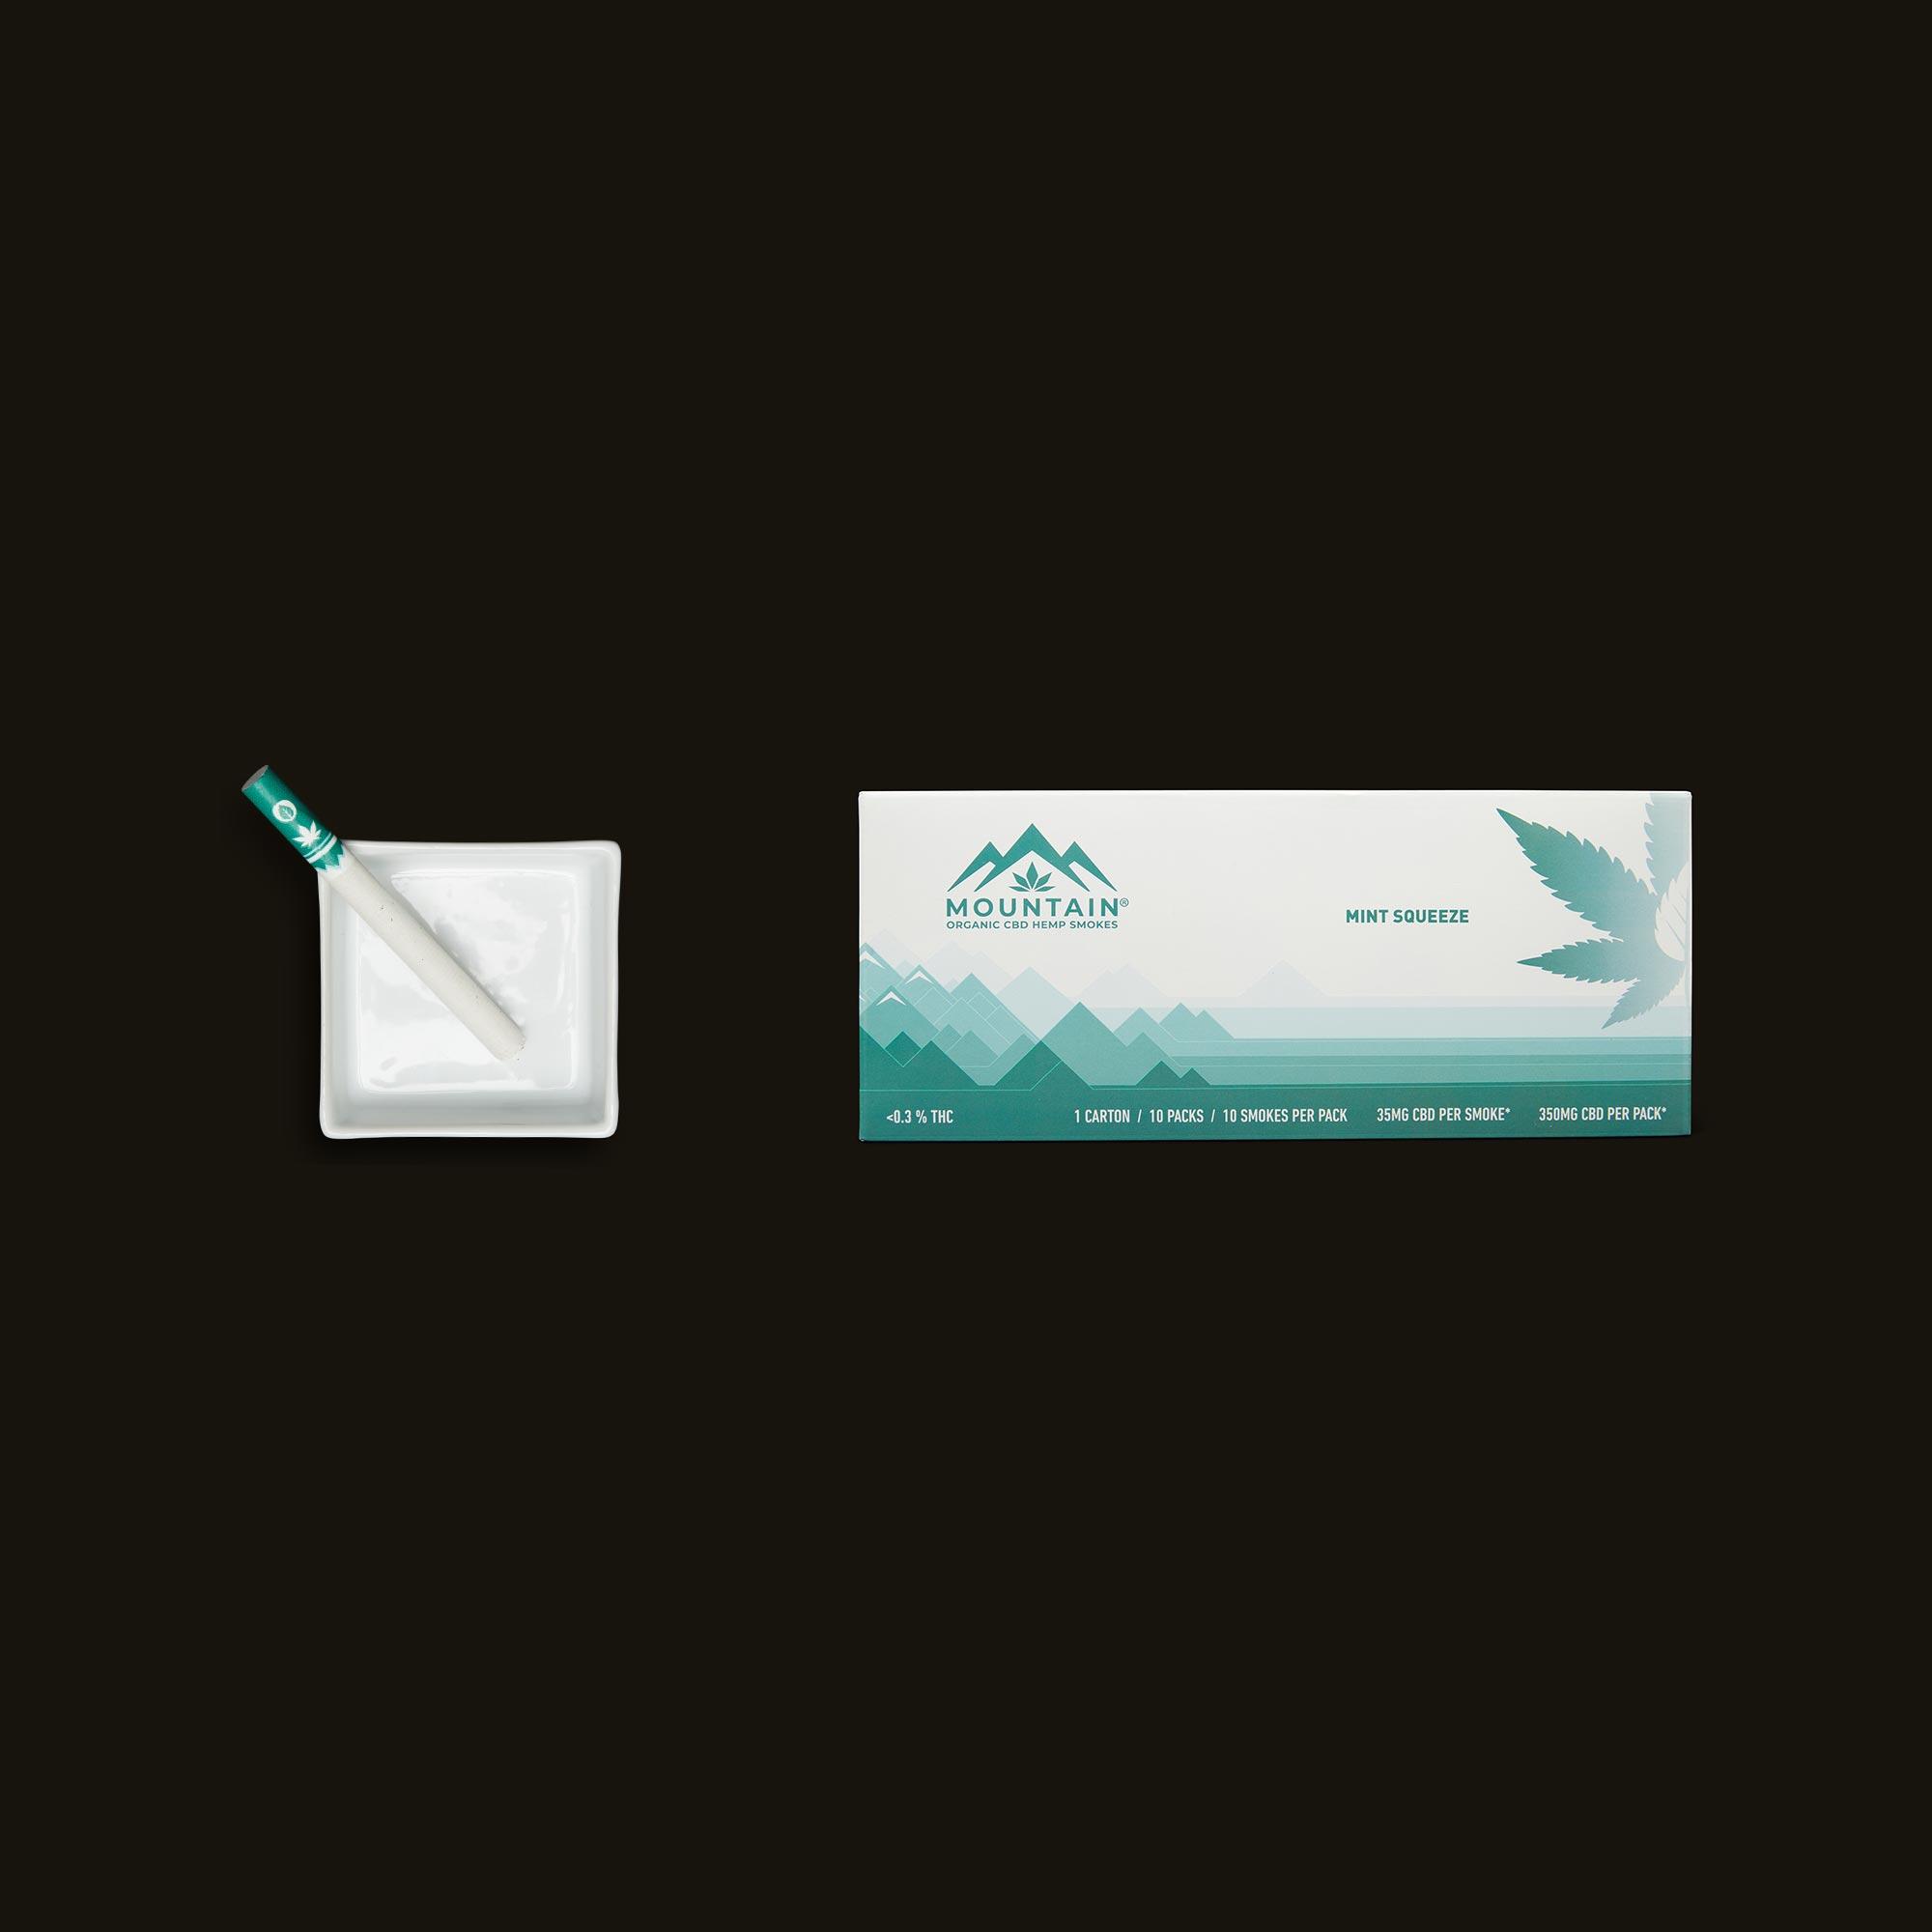 Mountain Smokes Mint Squeeze Carton of 10 Packs (35mg CBD)